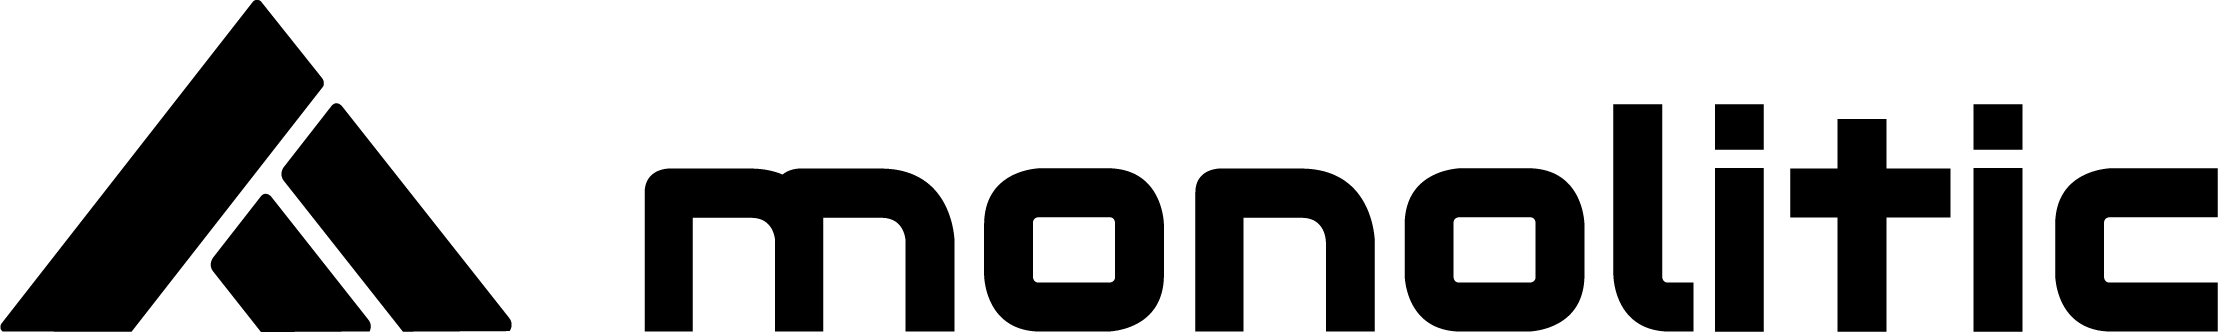 Monolitic logo